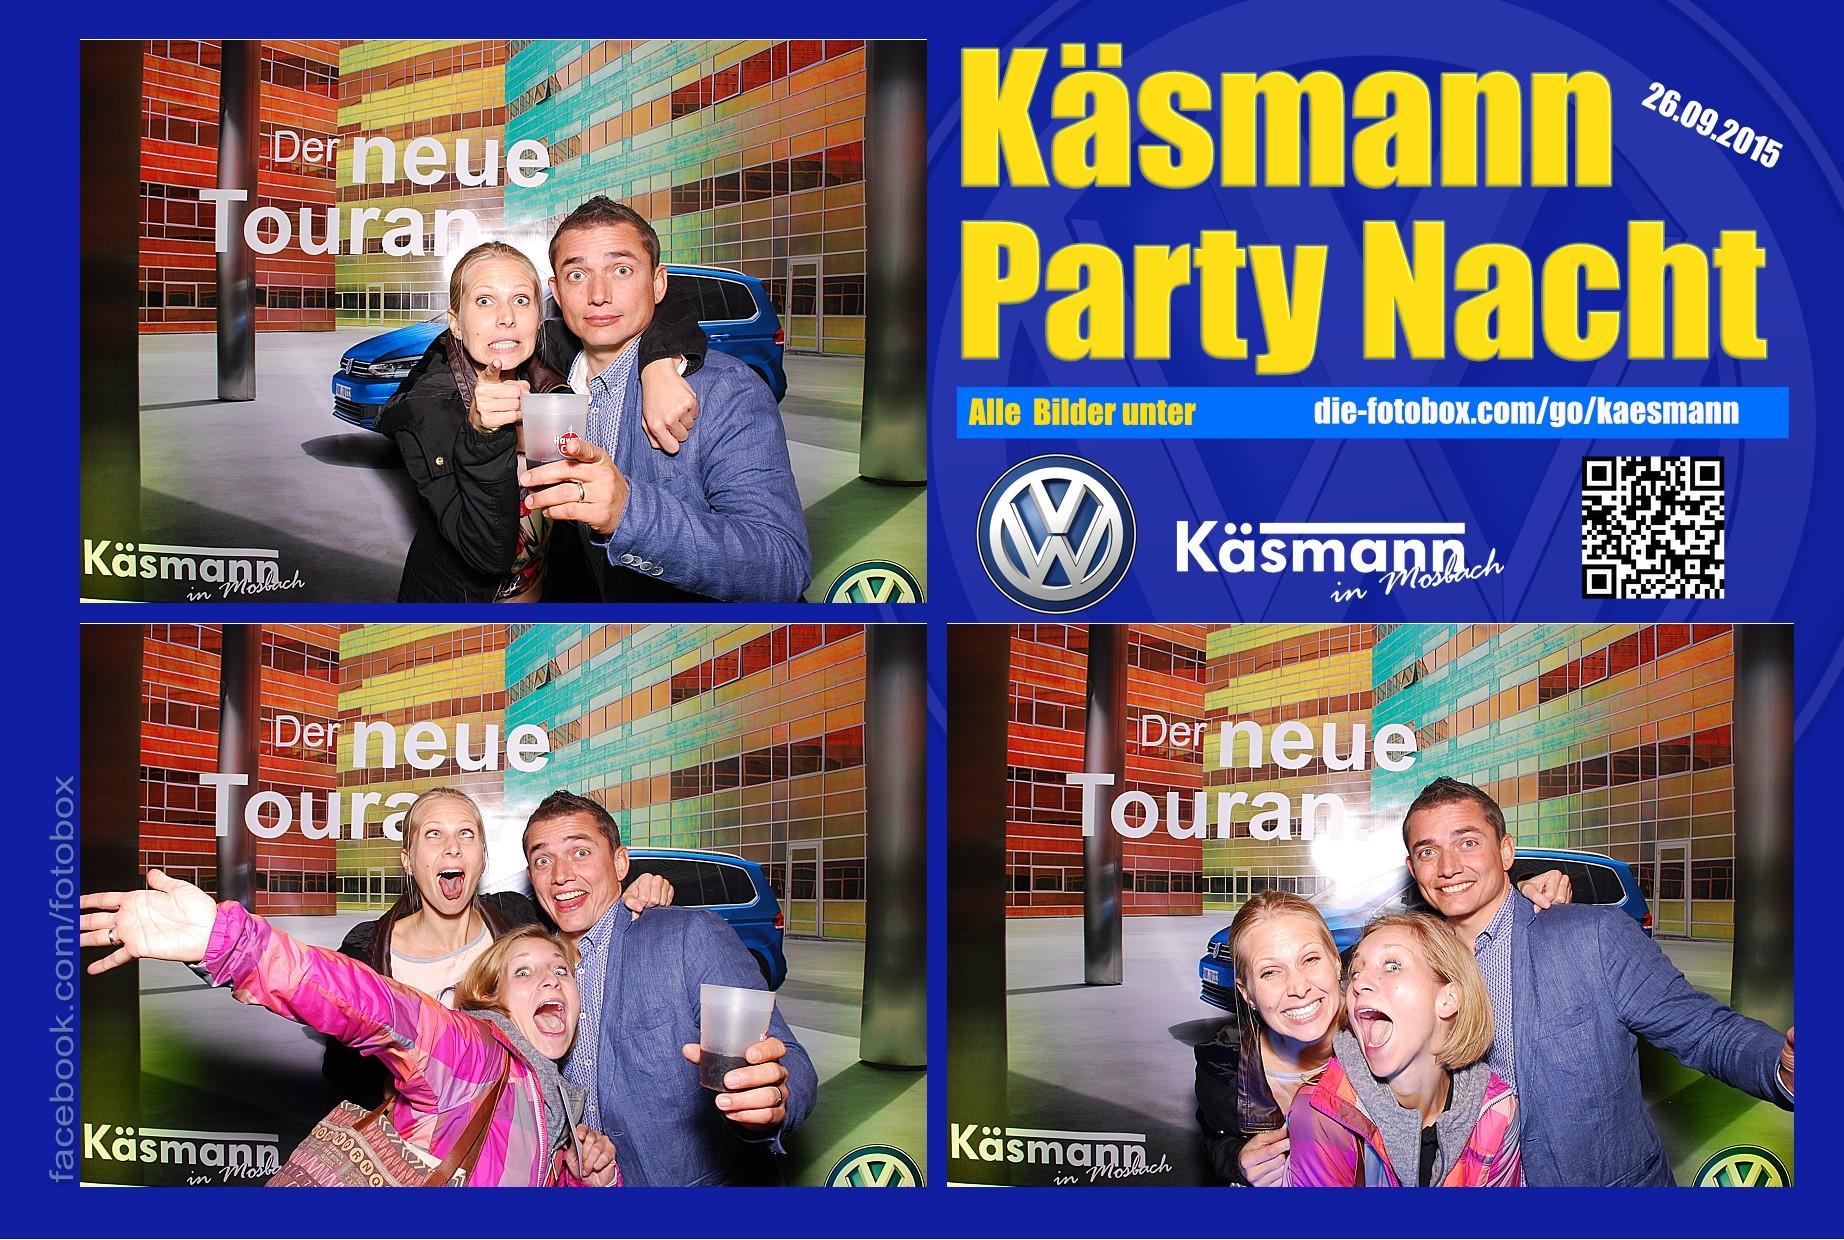 Käsmannparty 2015 - www.die-fotobox.com 01273